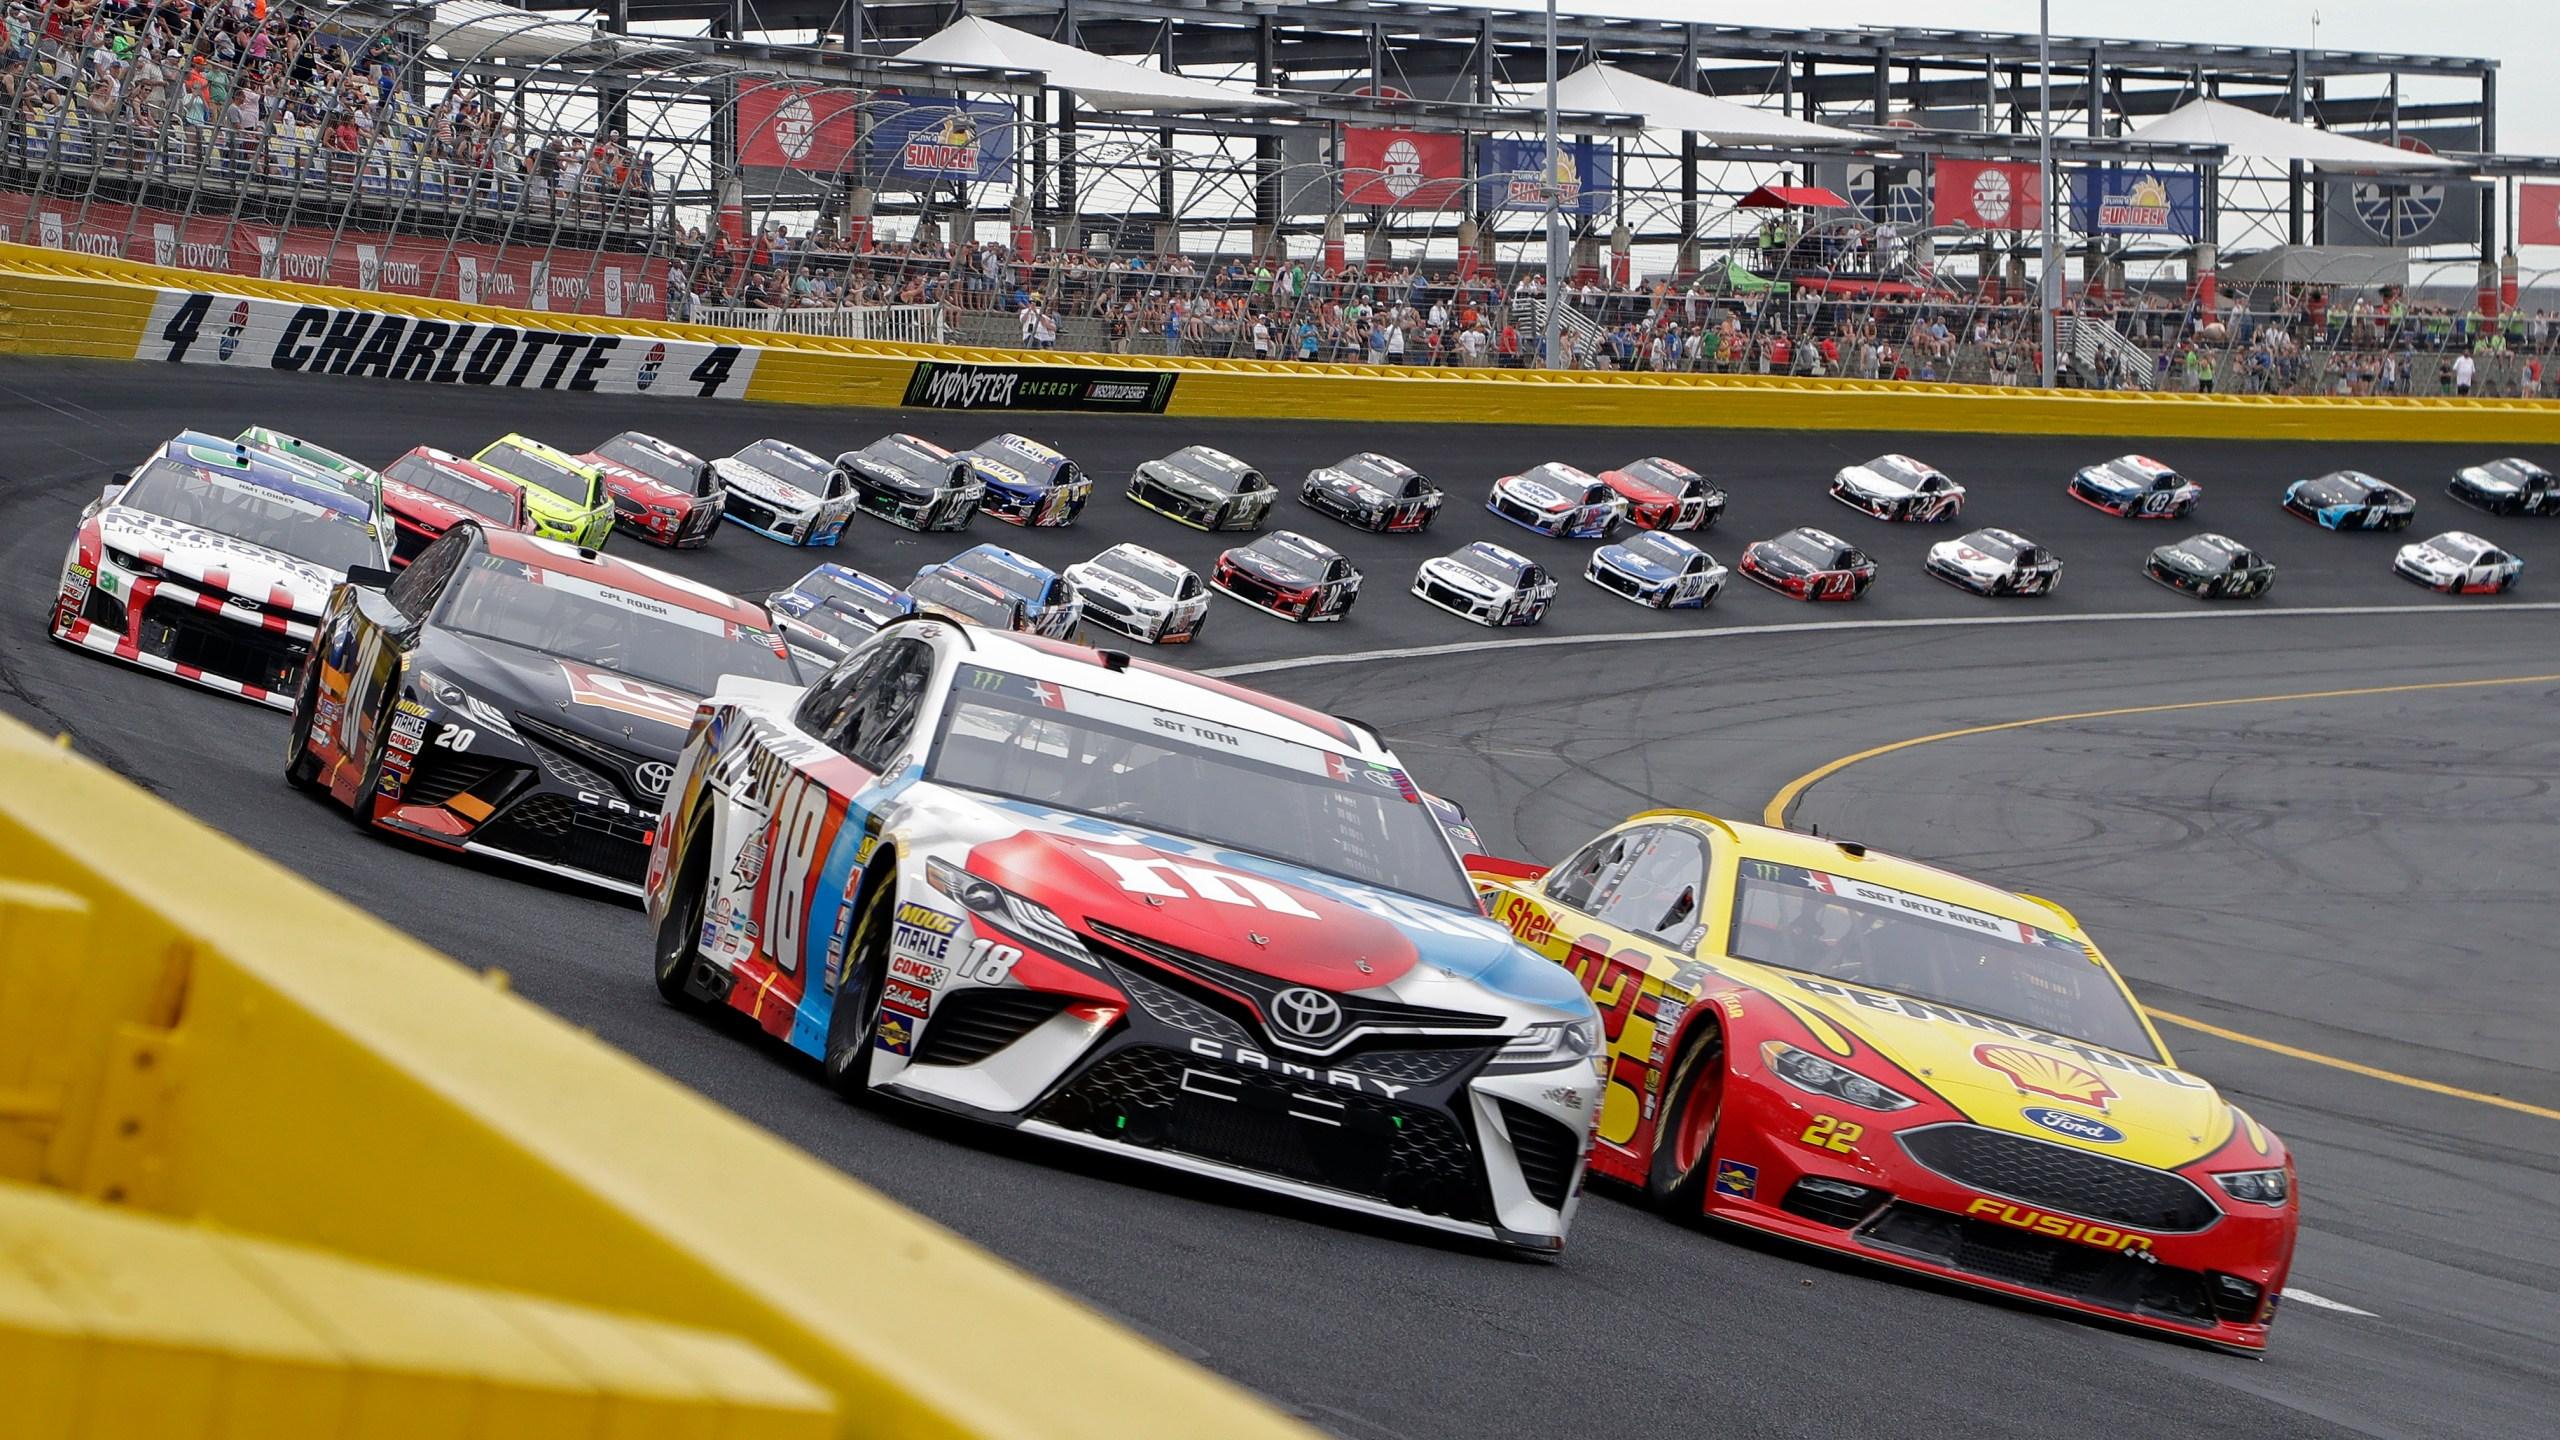 NASCAR_Charlotte_Auto_Racing_41661-159532.jpg57632702